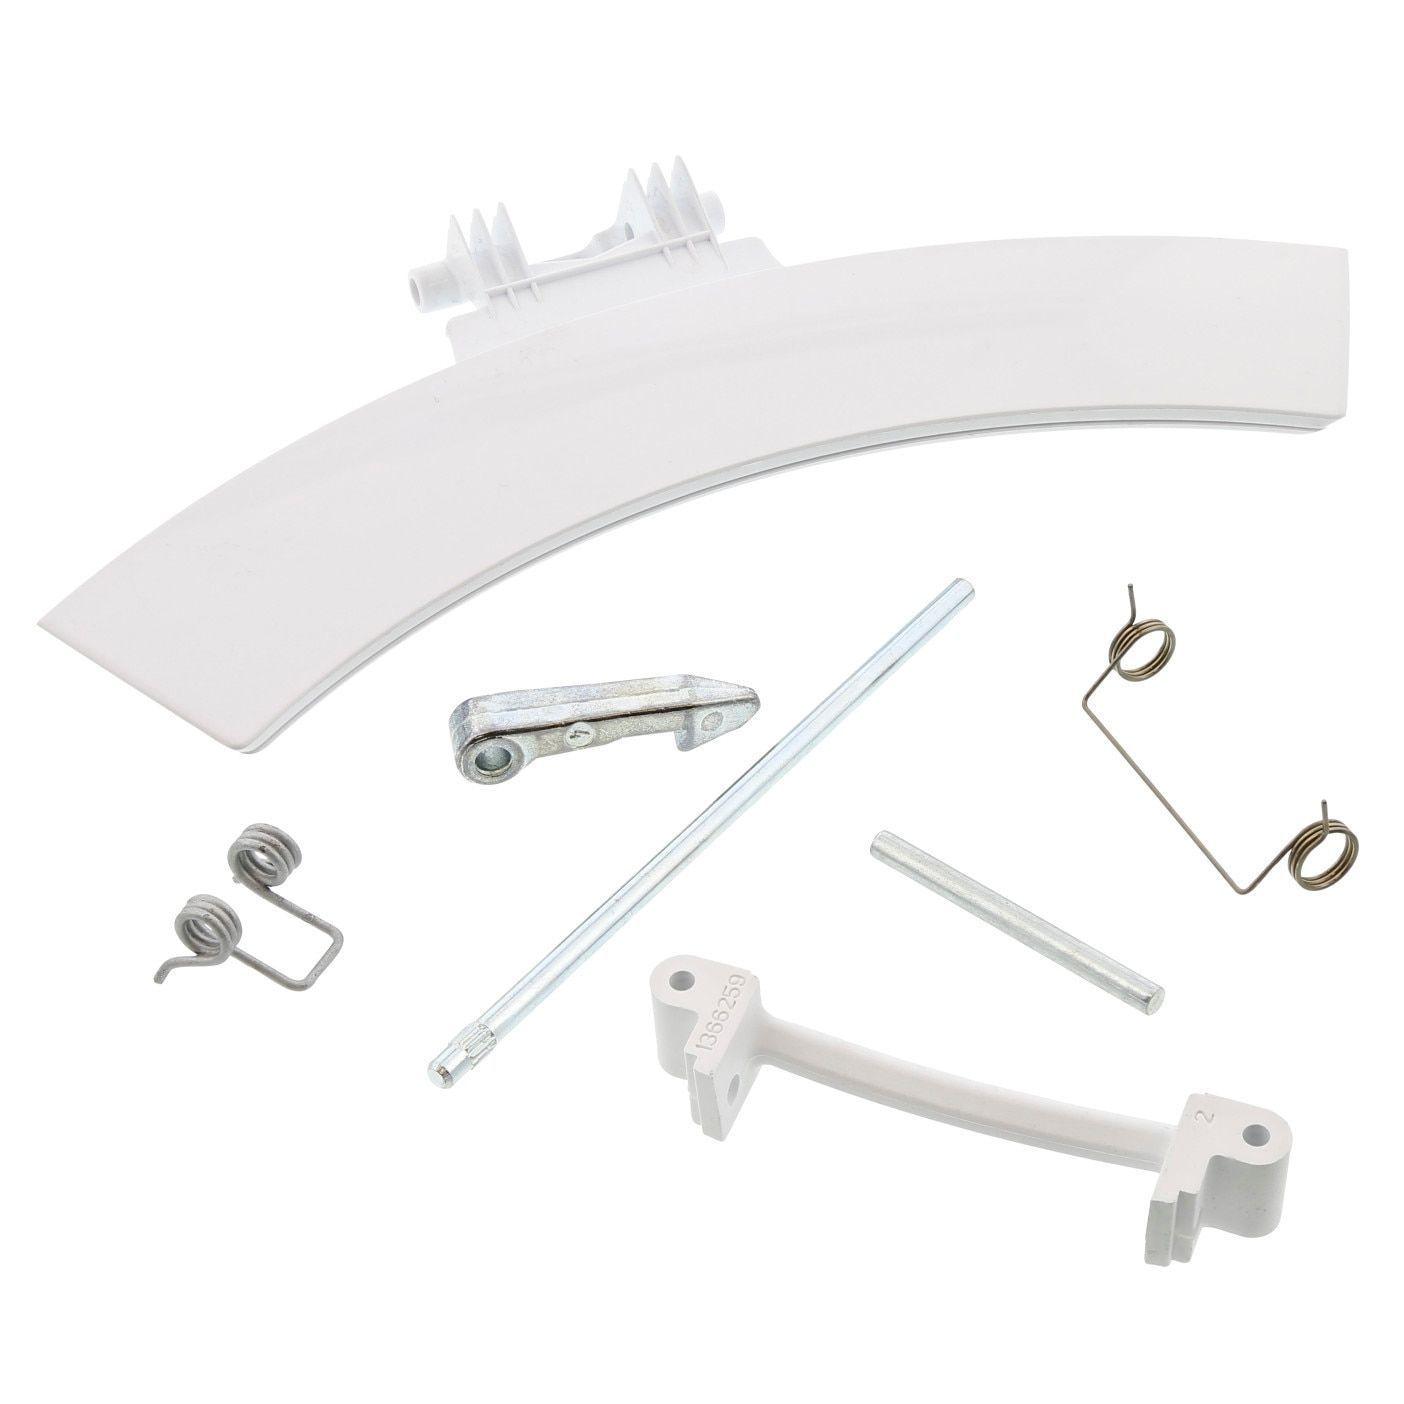 Tumble Dryer Door Handle Kit for Electrolux - 4055248019 AEG / Electrolux / Zanussi